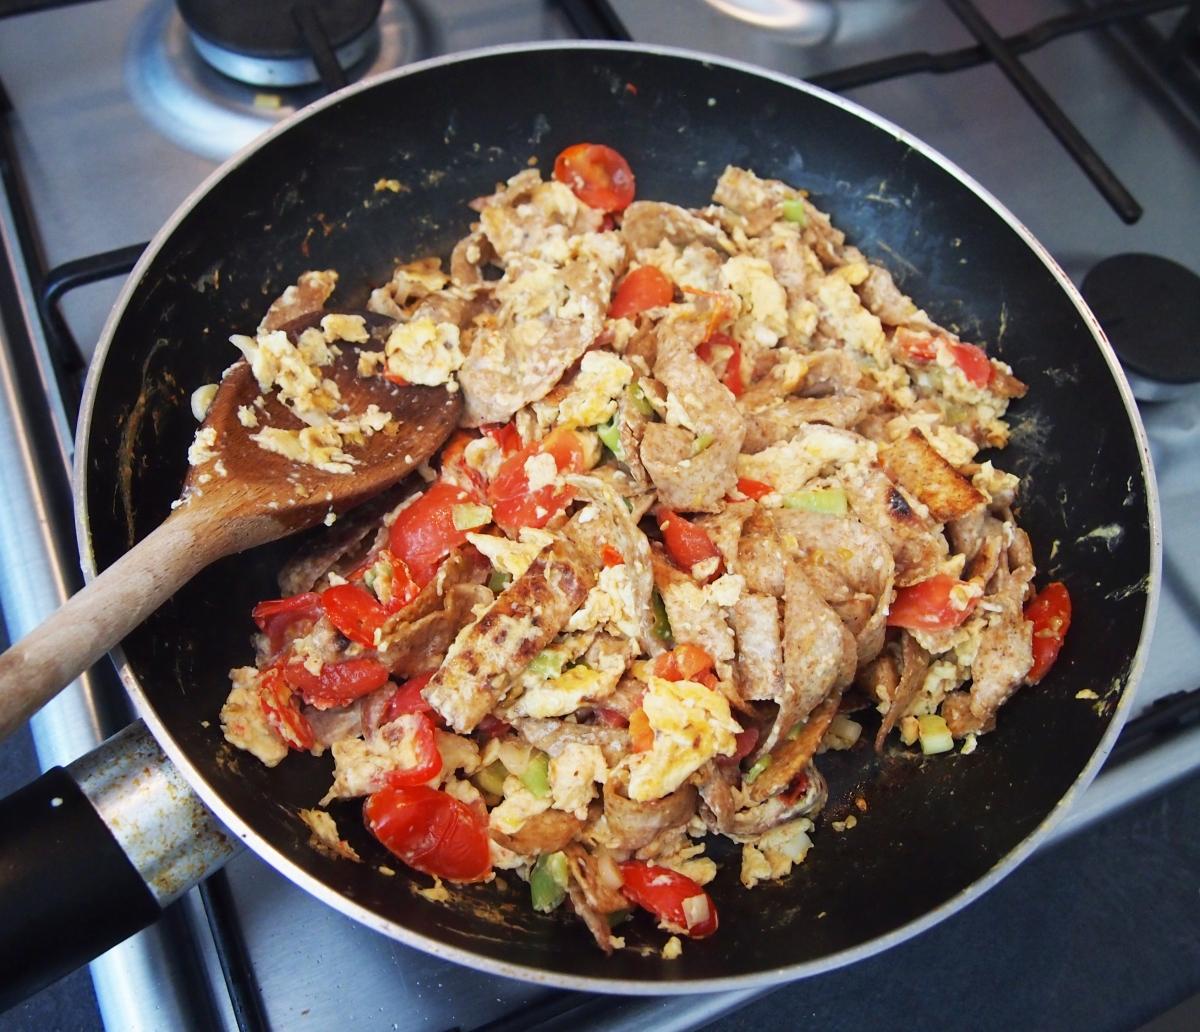 Mexican Scrambled Eggs Final Pan